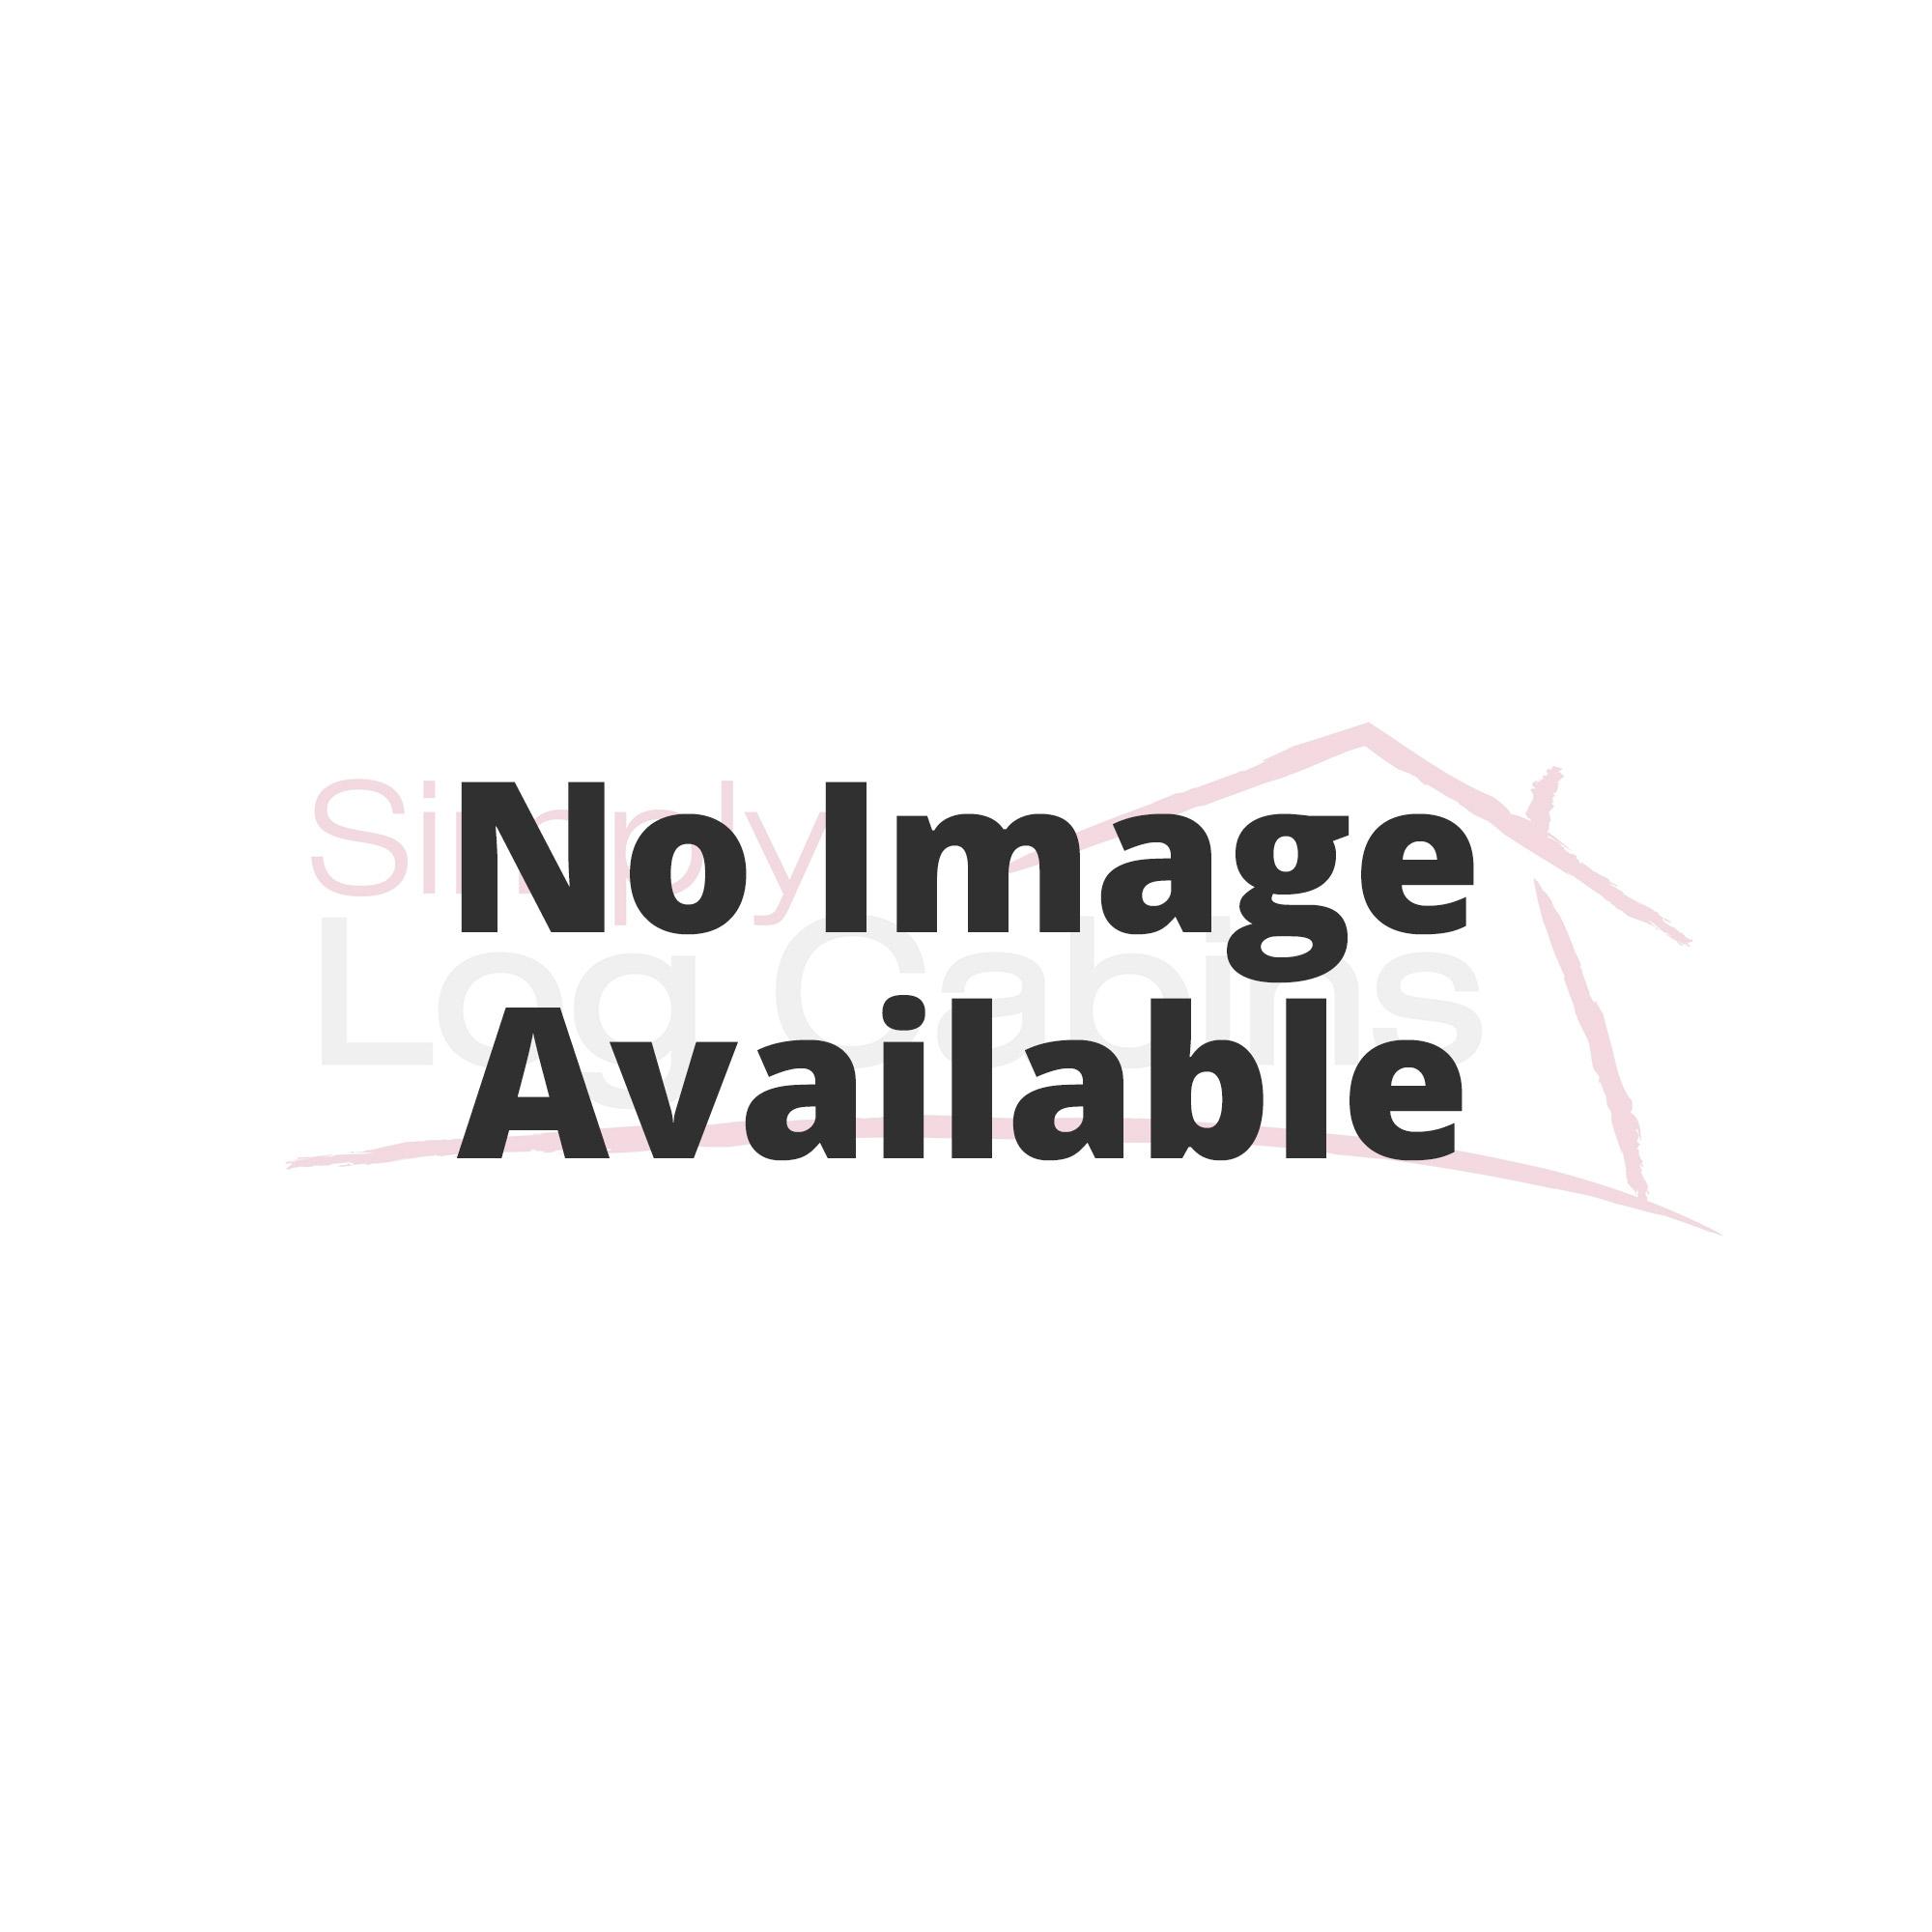 Norland Bingham 3 Log Cabin